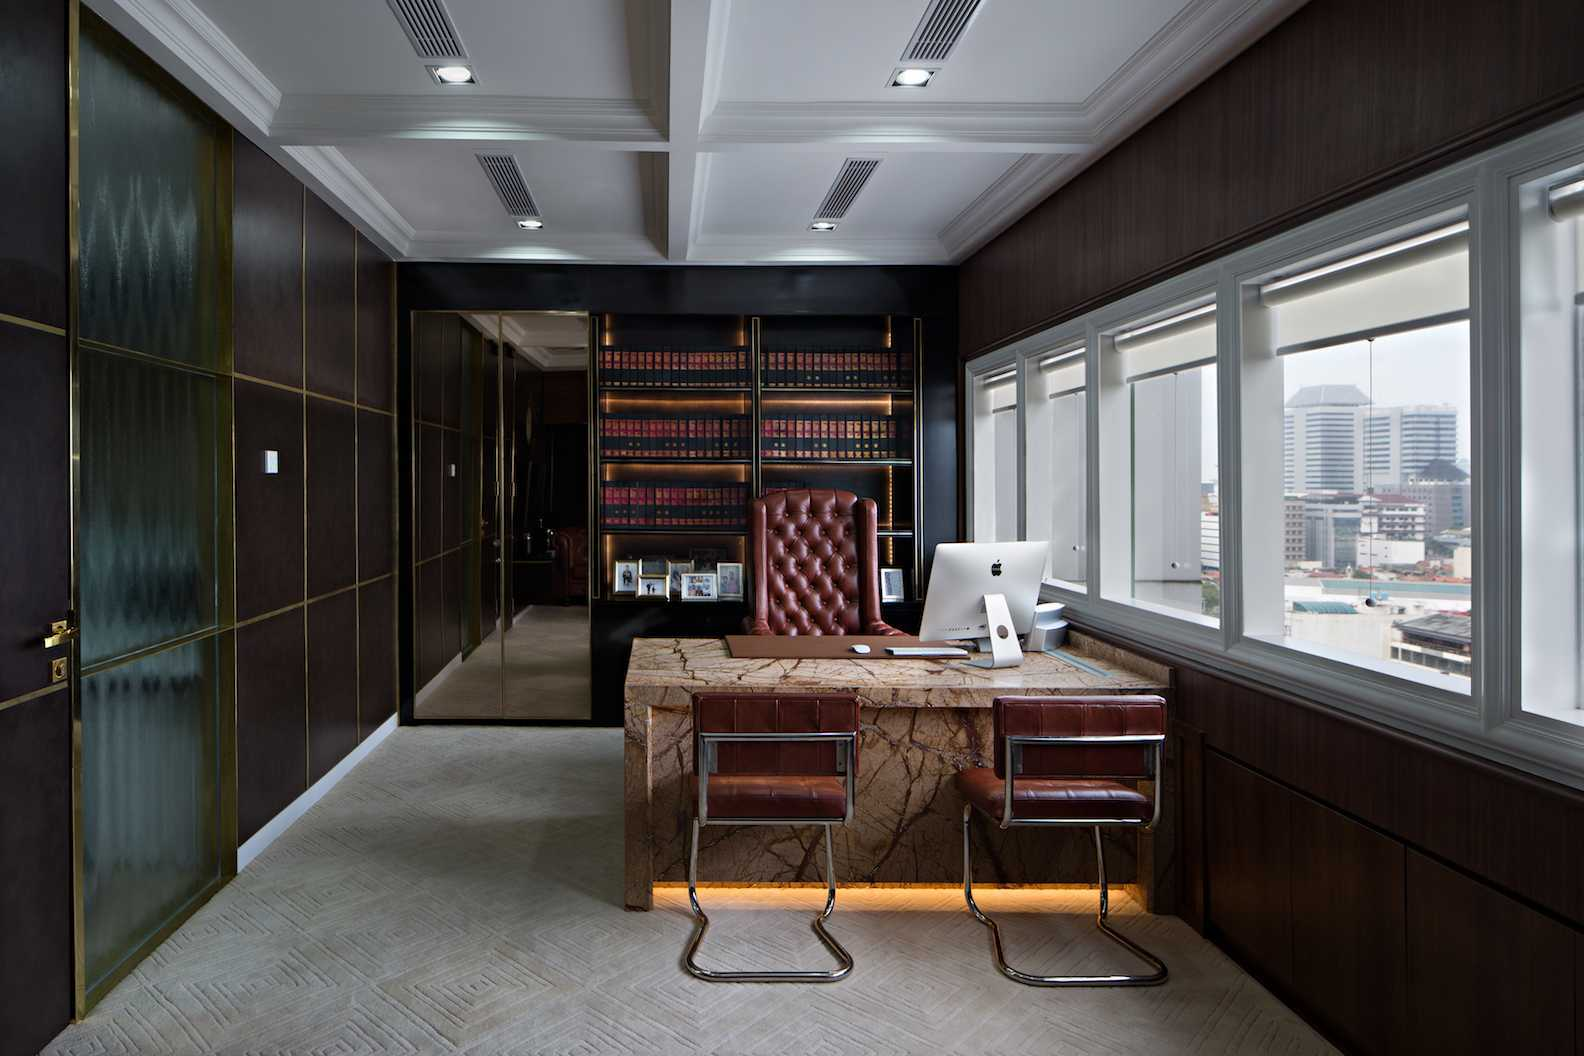 Pt Asa Adiguna Hanis & Hanis Advocate Sarinah Building Sarinah Building Office Room Minimalis  24580